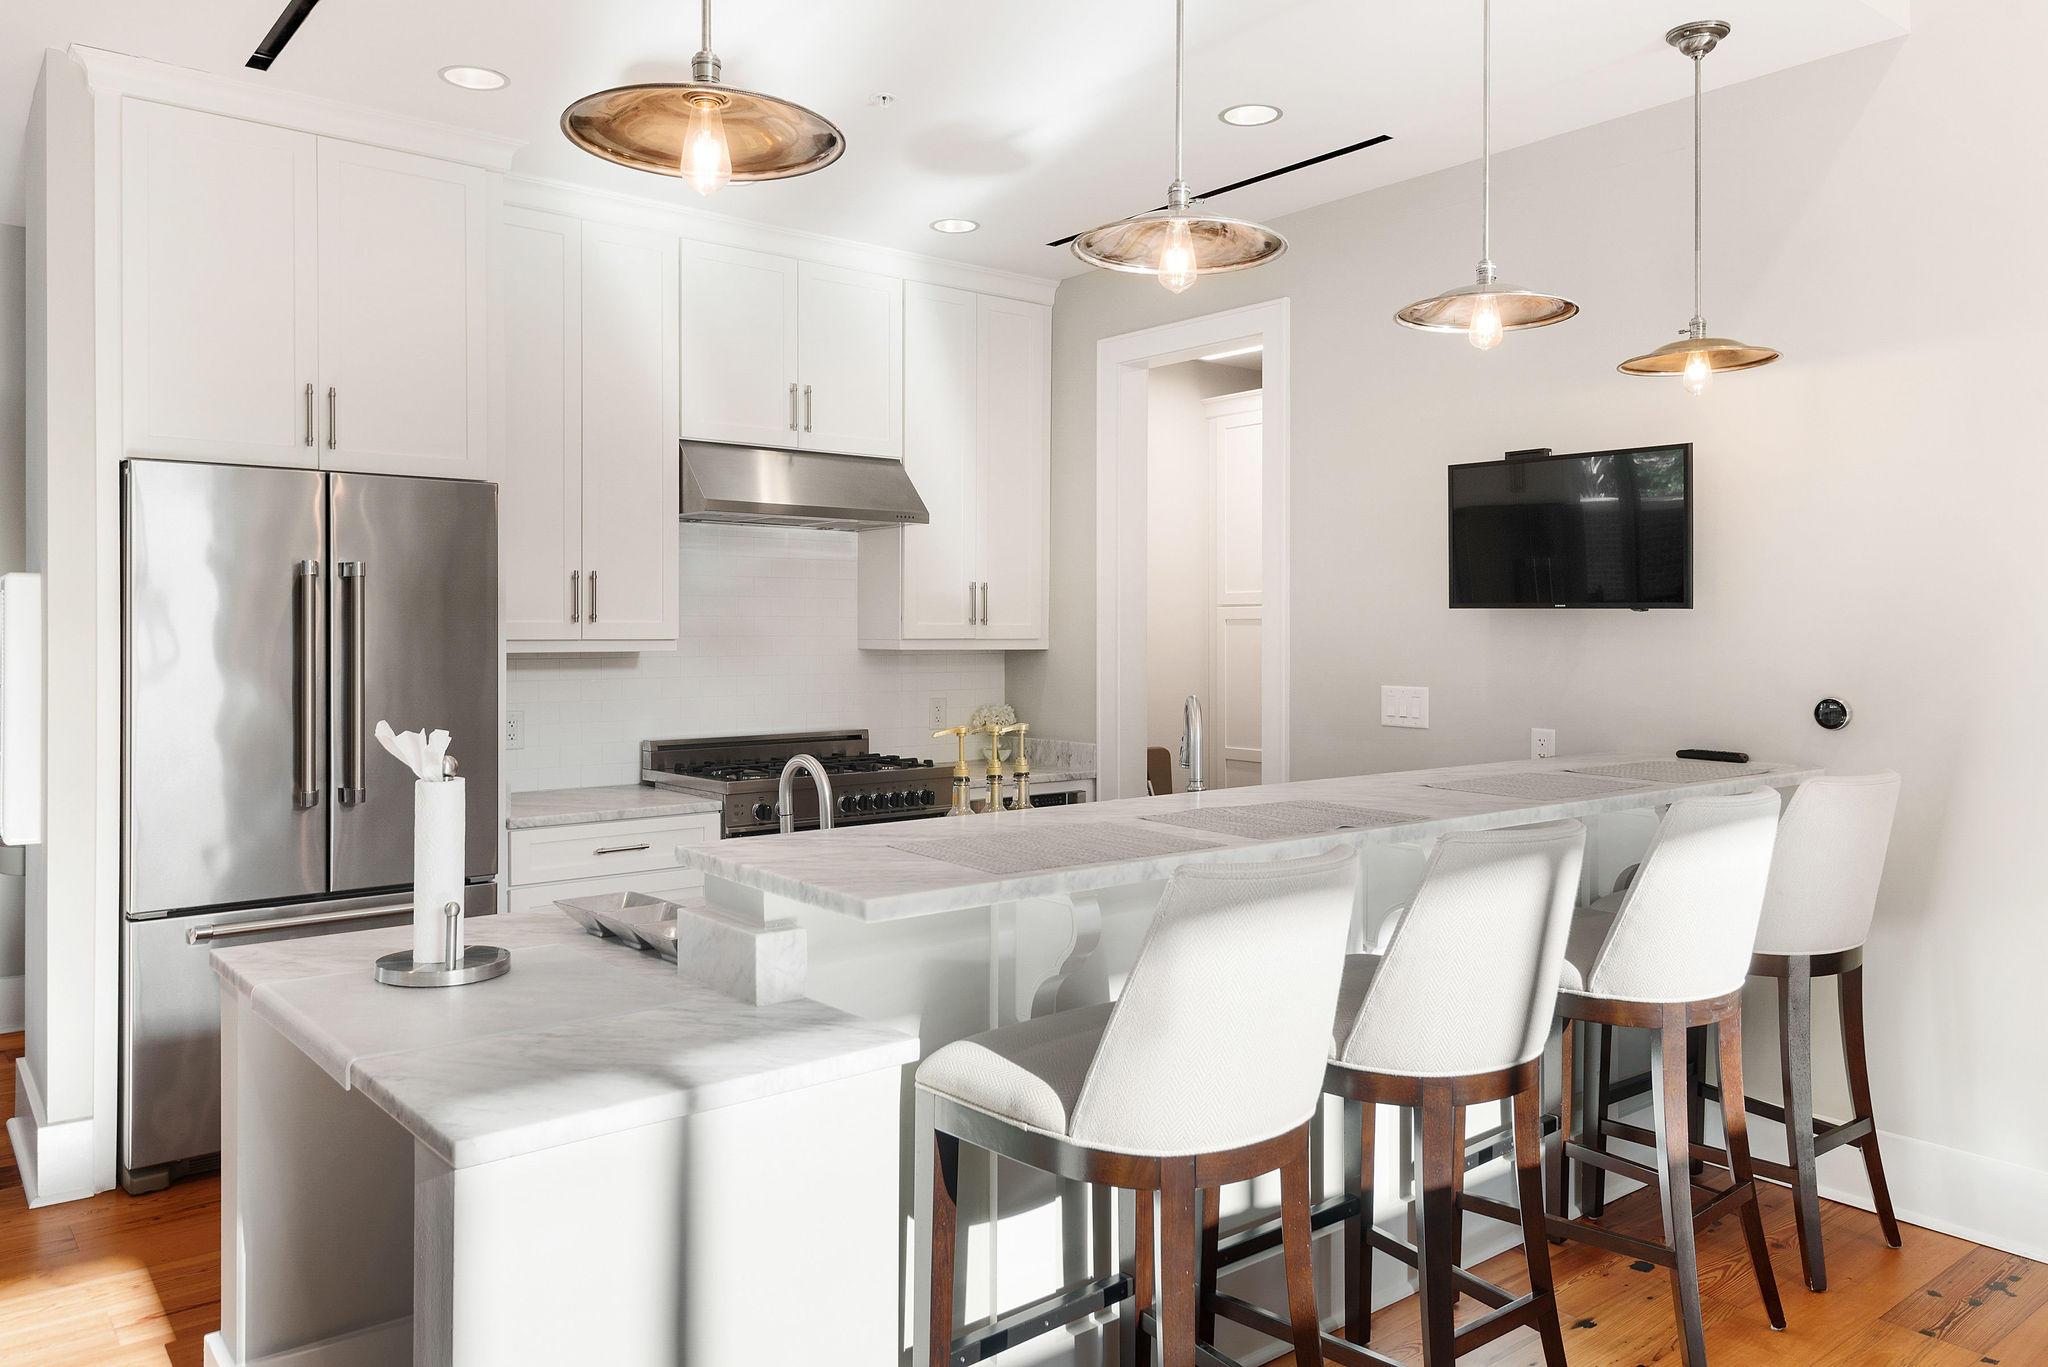 Tides IV Condominiums Homes For Sale - 155 Wingo, Mount Pleasant, SC - 20